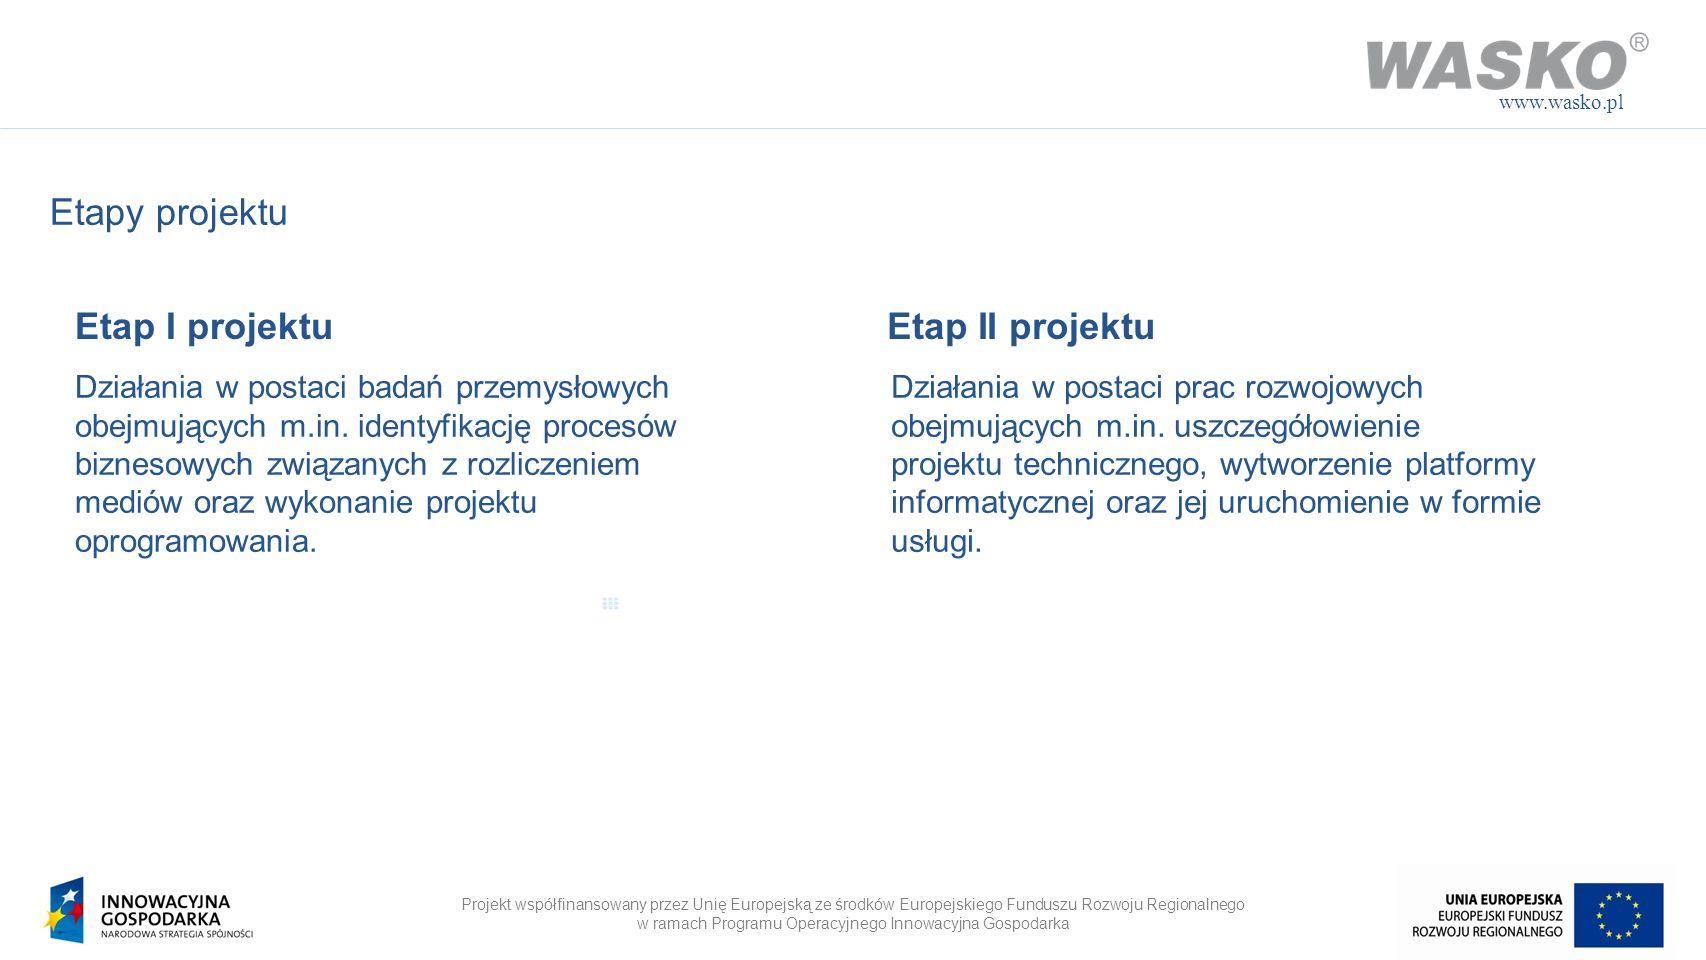 Etapy projektu Etap I projektu Etap II projektu